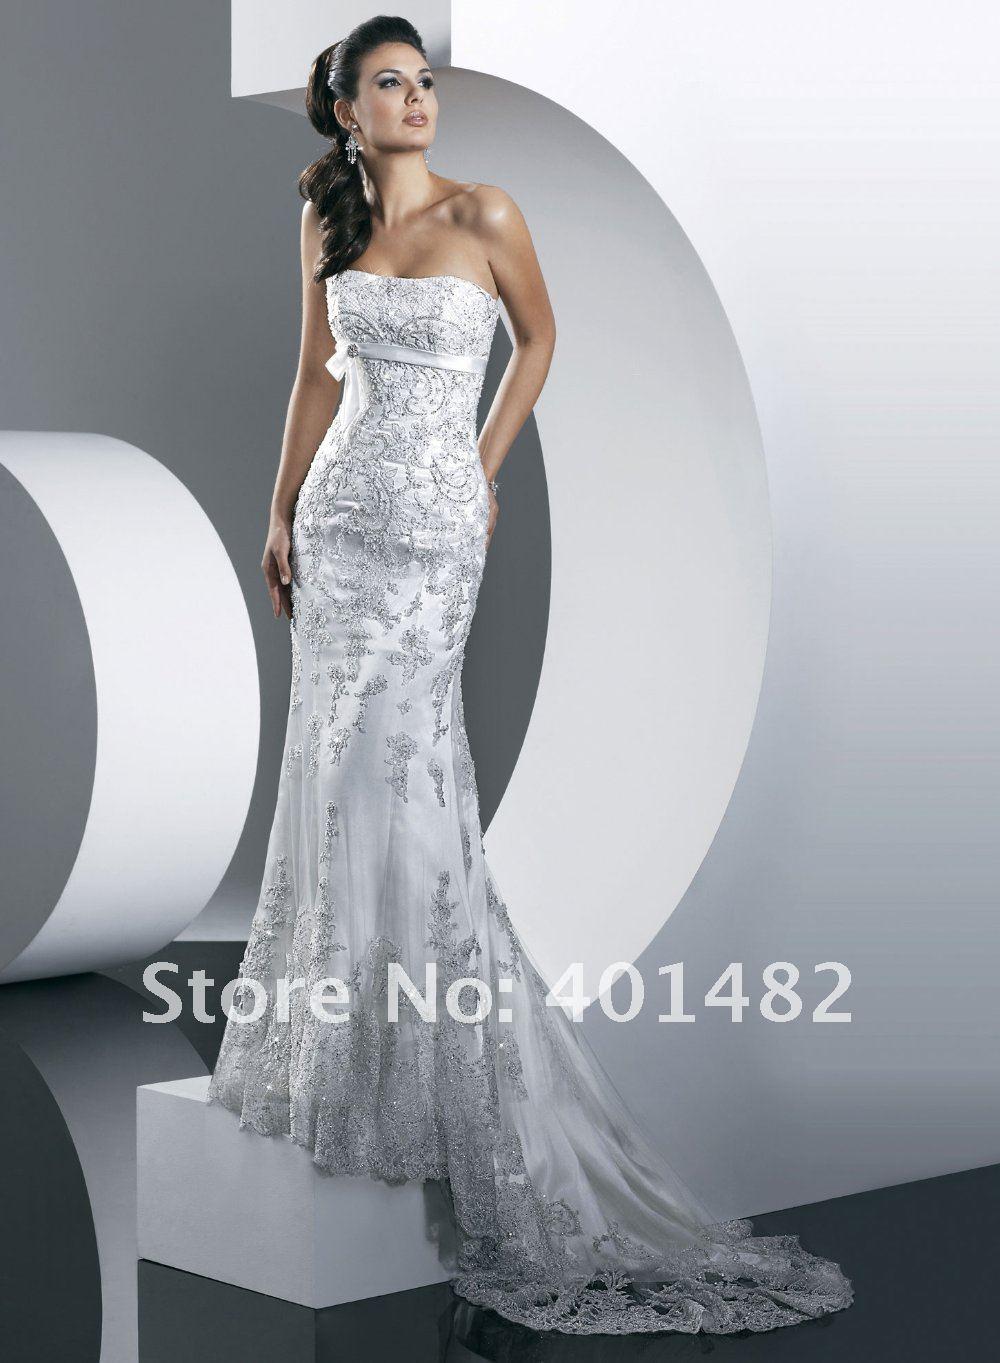 straight wedding dress straight wedding dresses Straight Across Wedding Dresses Collection Neck